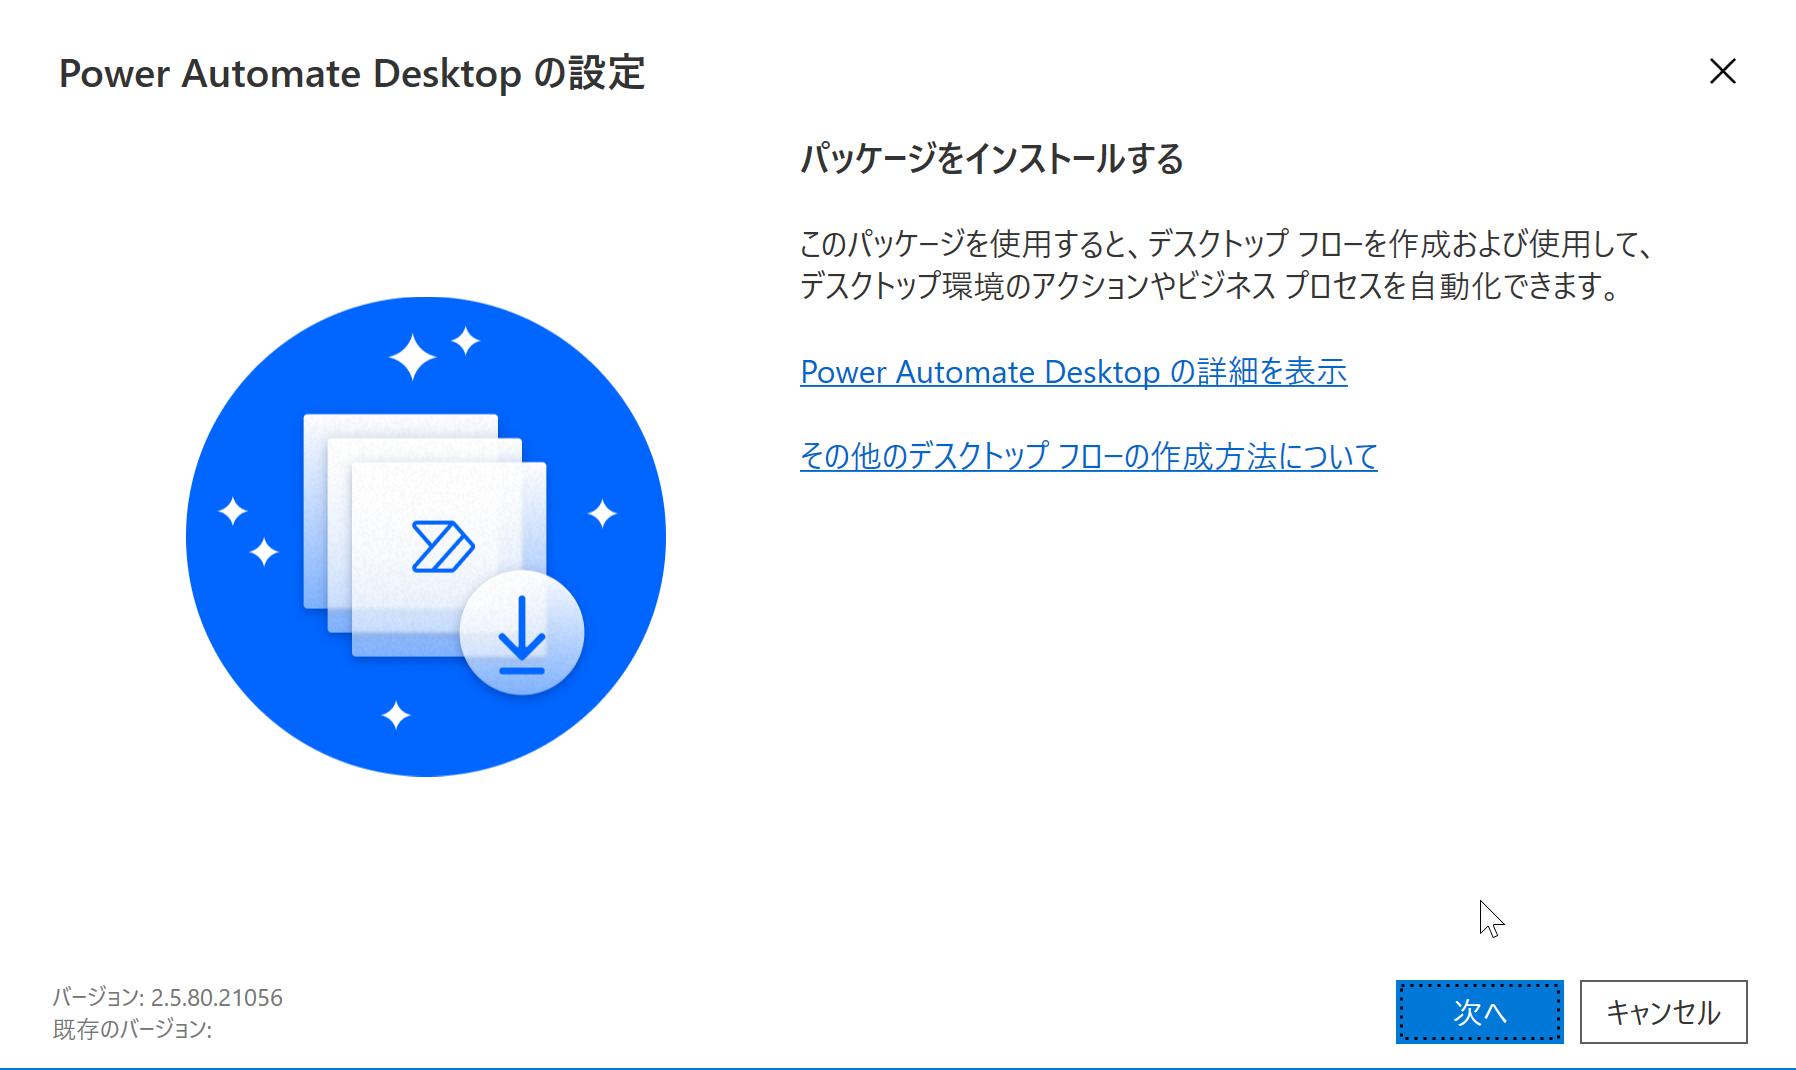 https://s3.ap-northeast-1.amazonaws.com/site.docurain.jp/blog/2021/03/スクリーンショット-2021-03-03-12.19.43.png